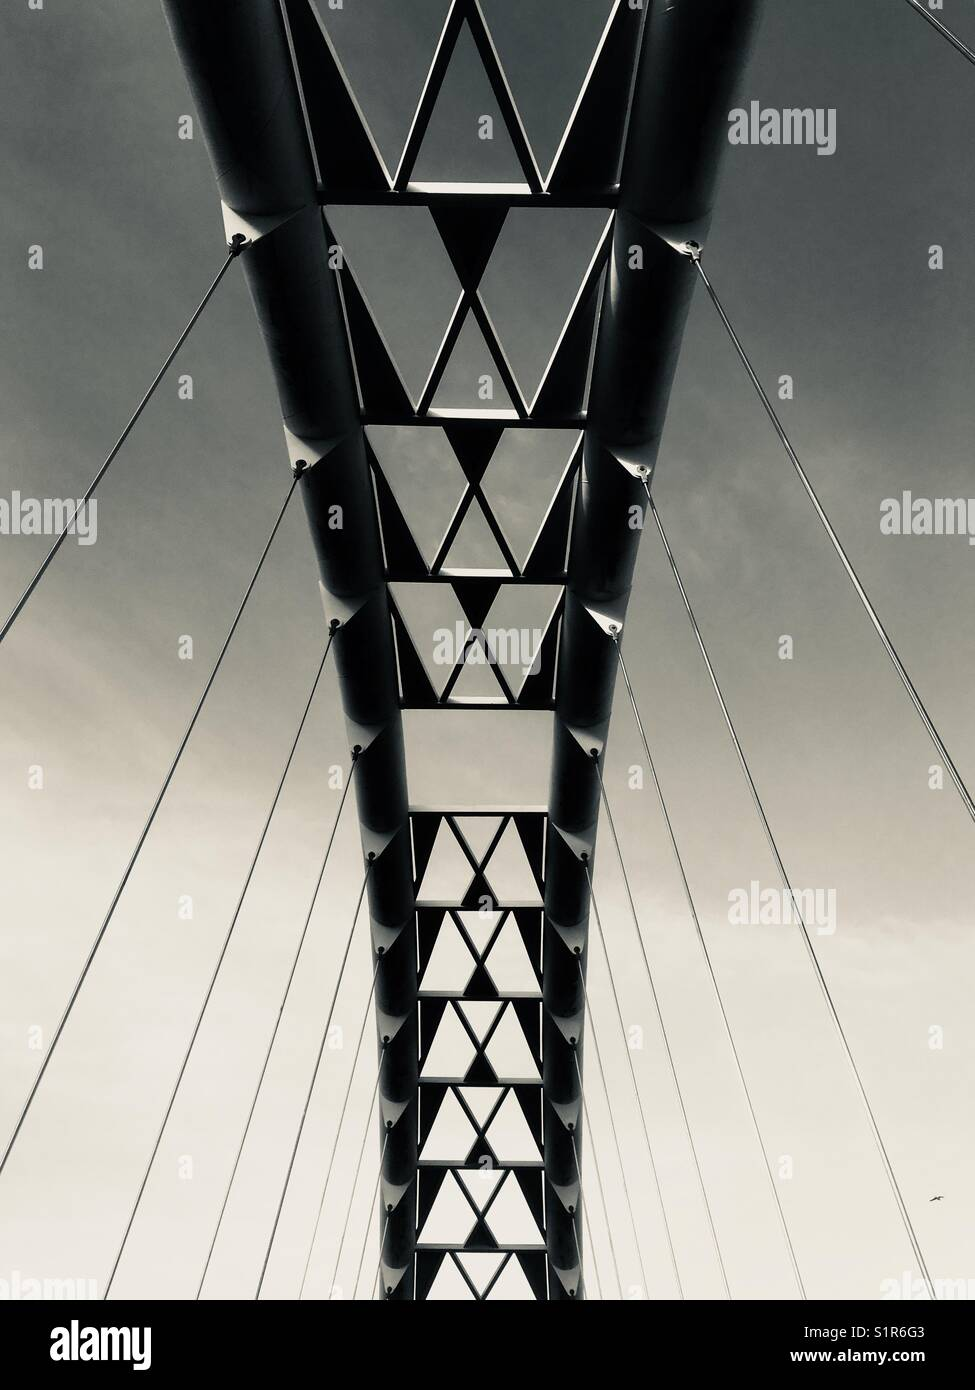 Humber bay puente de arco, Toronto, Canadá Imagen De Stock